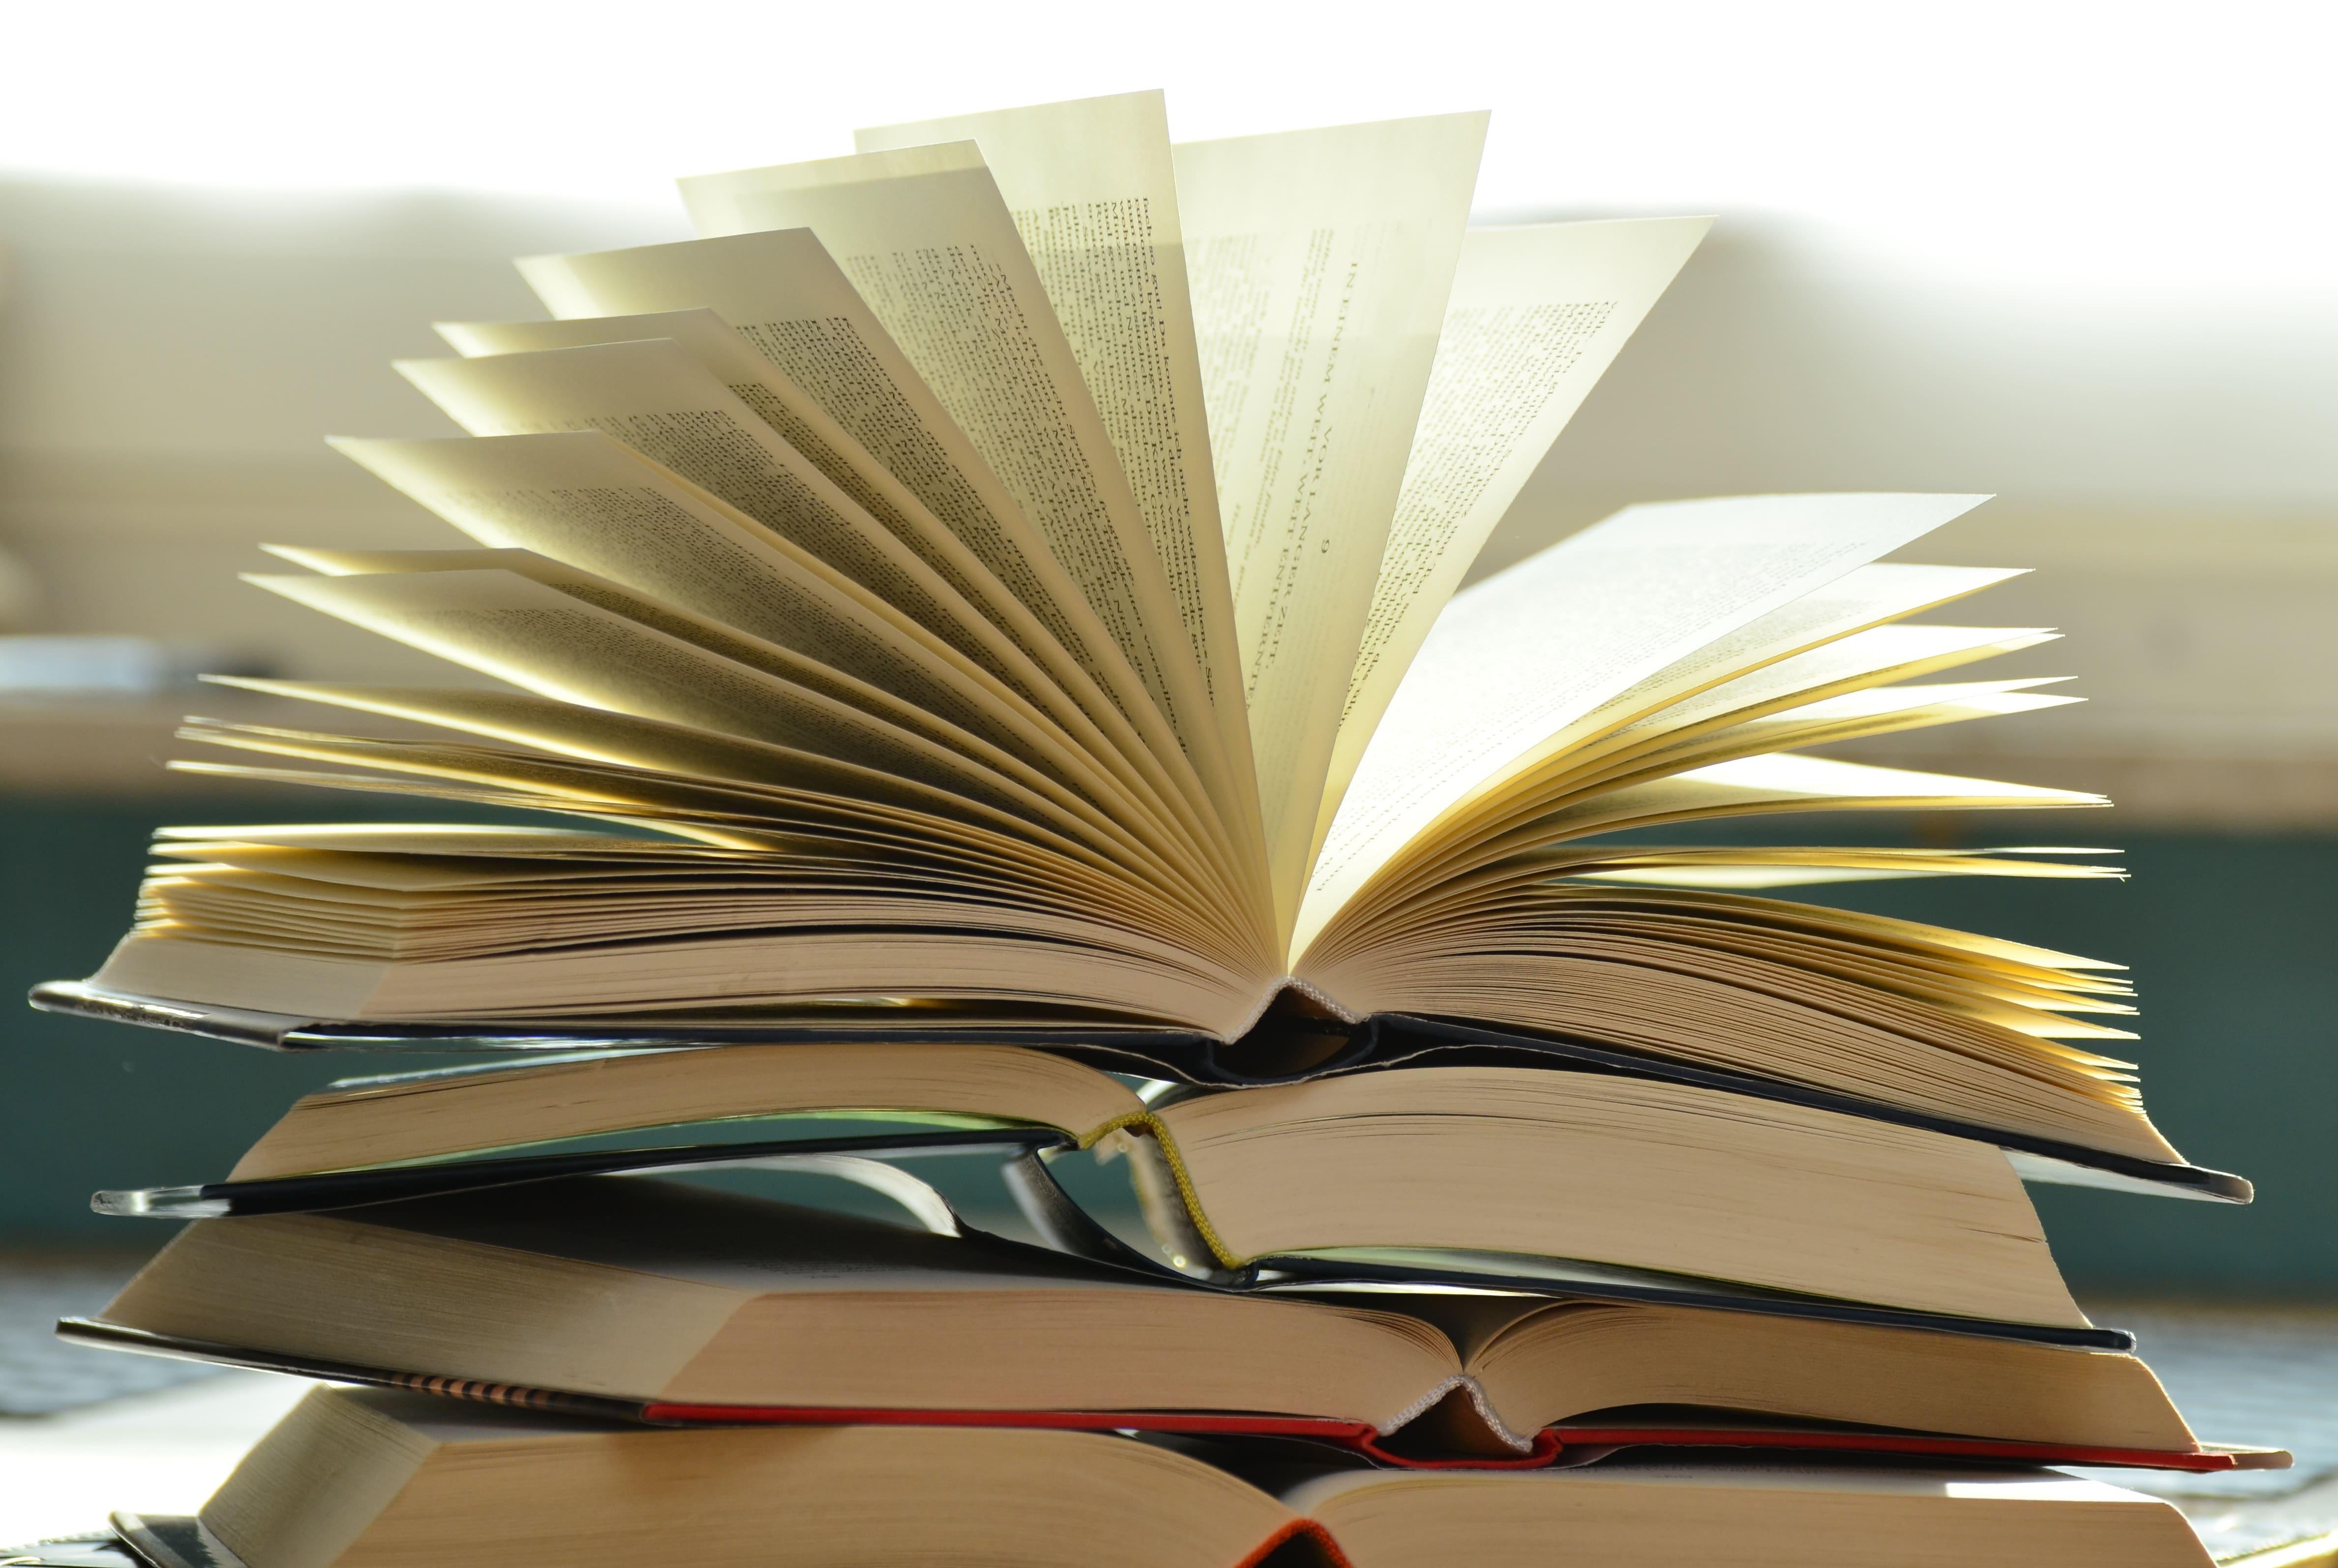 Księgarnie